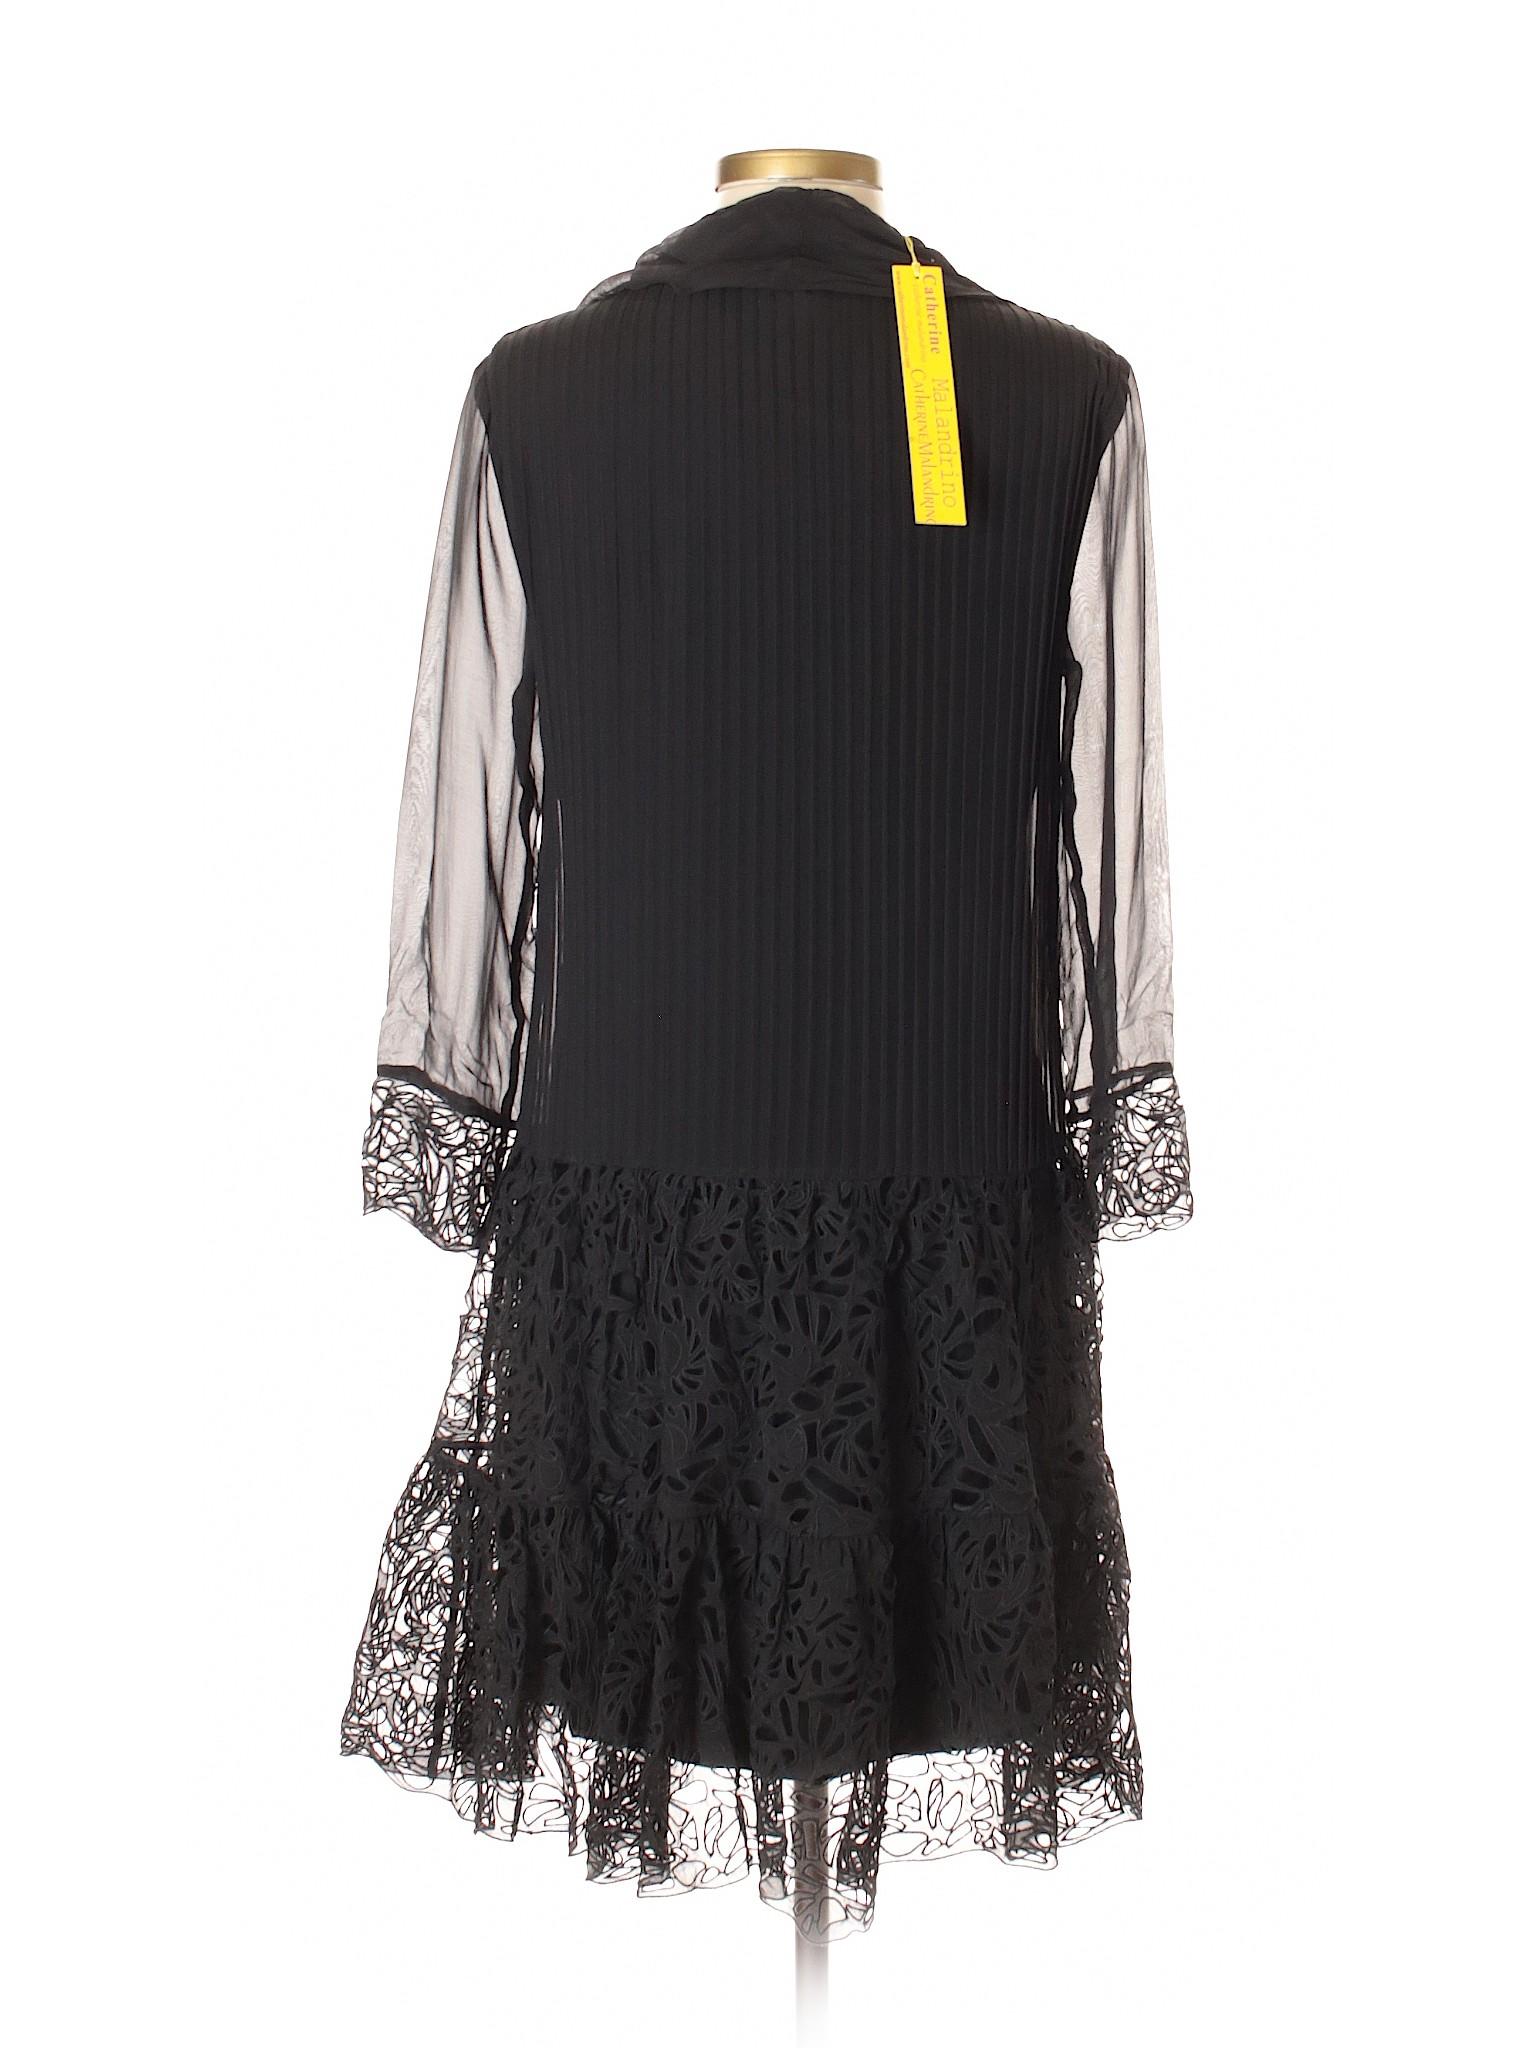 Casual Casual Selling Dress Malandrino Selling Catherine Selling Malandrino Catherine Catherine Dress qAnxwfRqzt